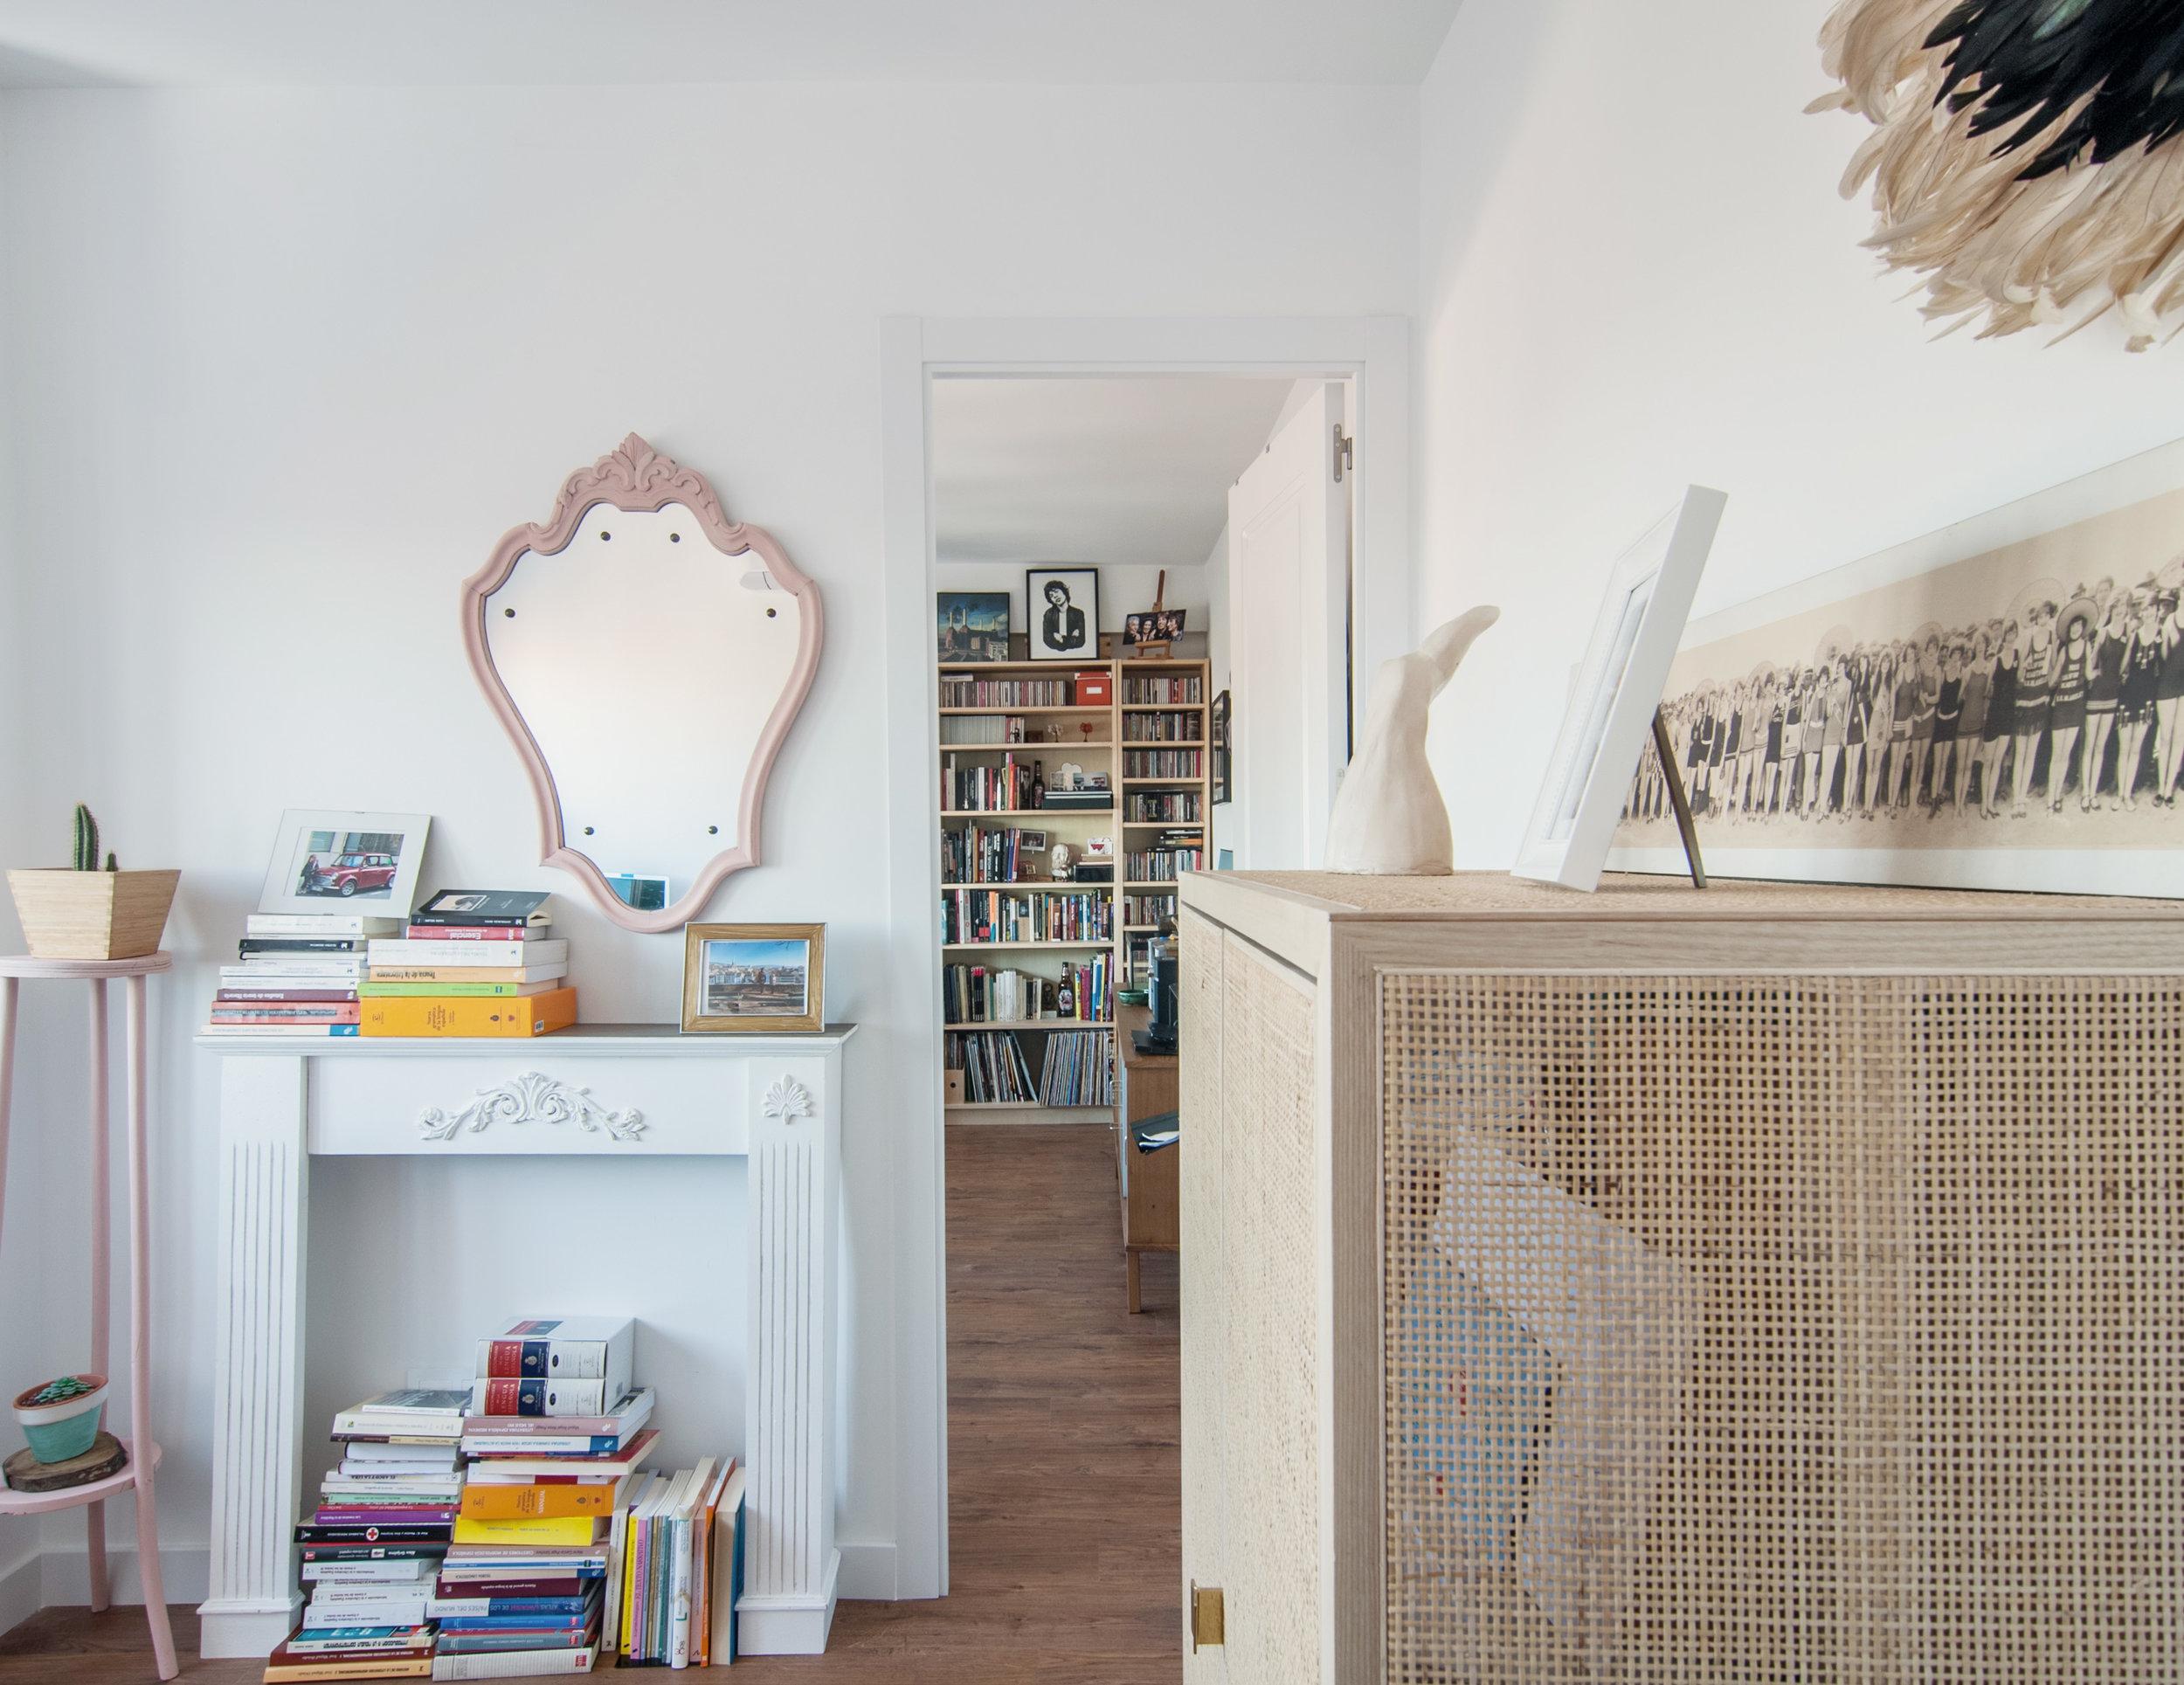 emmme studio slow design interiorismo integral estudio2 hogar Debora.jpg